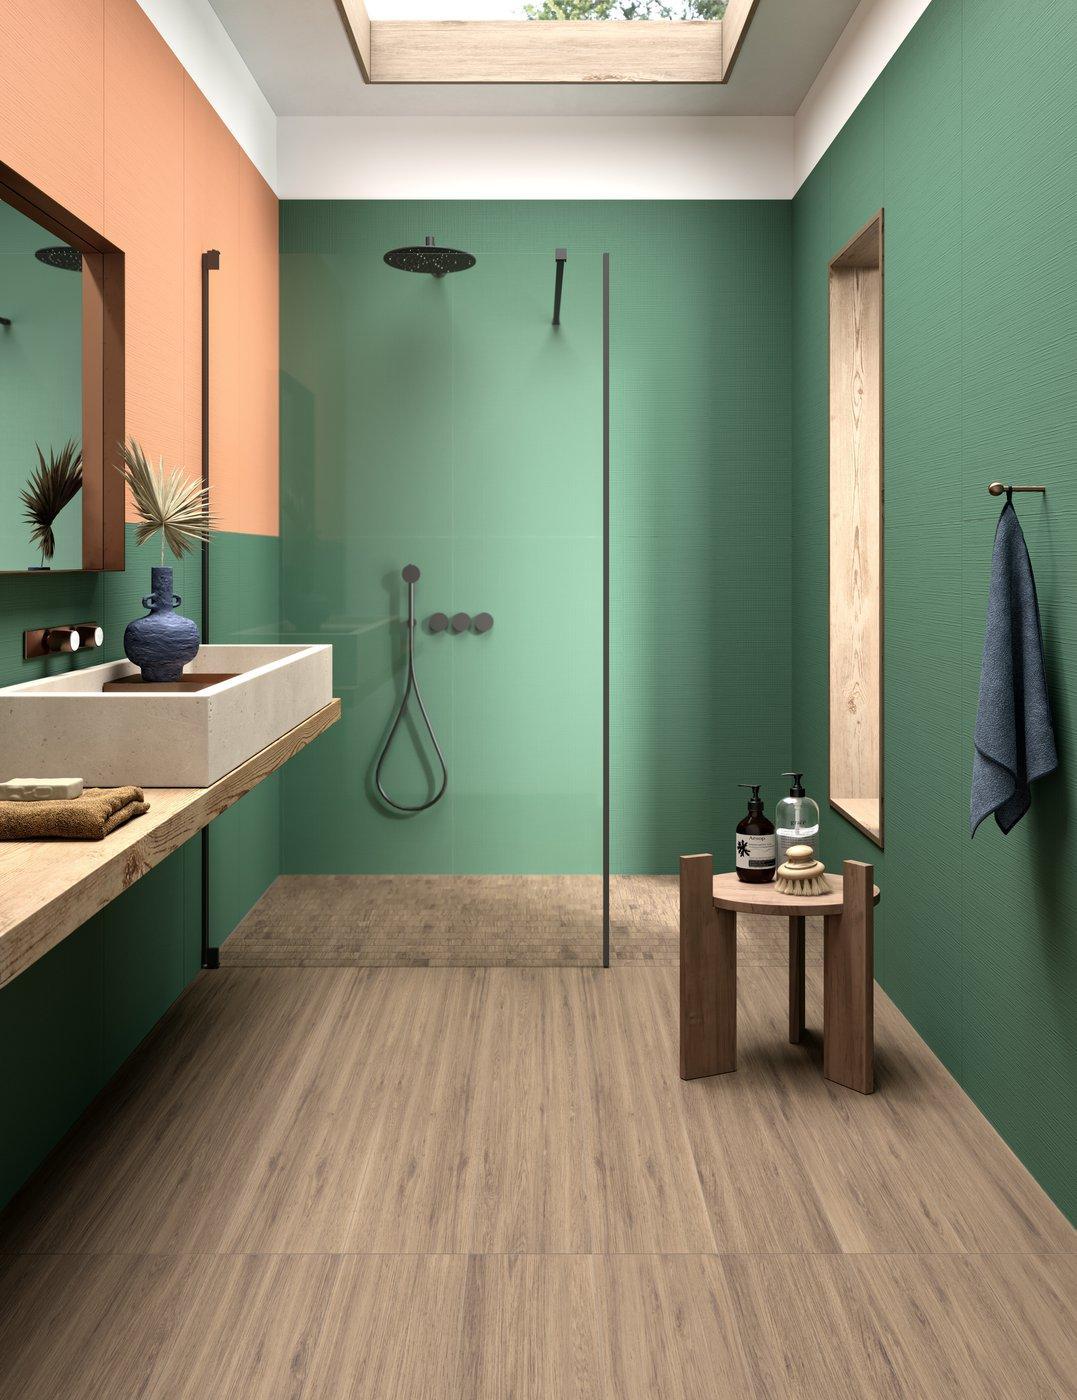 Zelená v kúpeľni - Obrázok č. 17